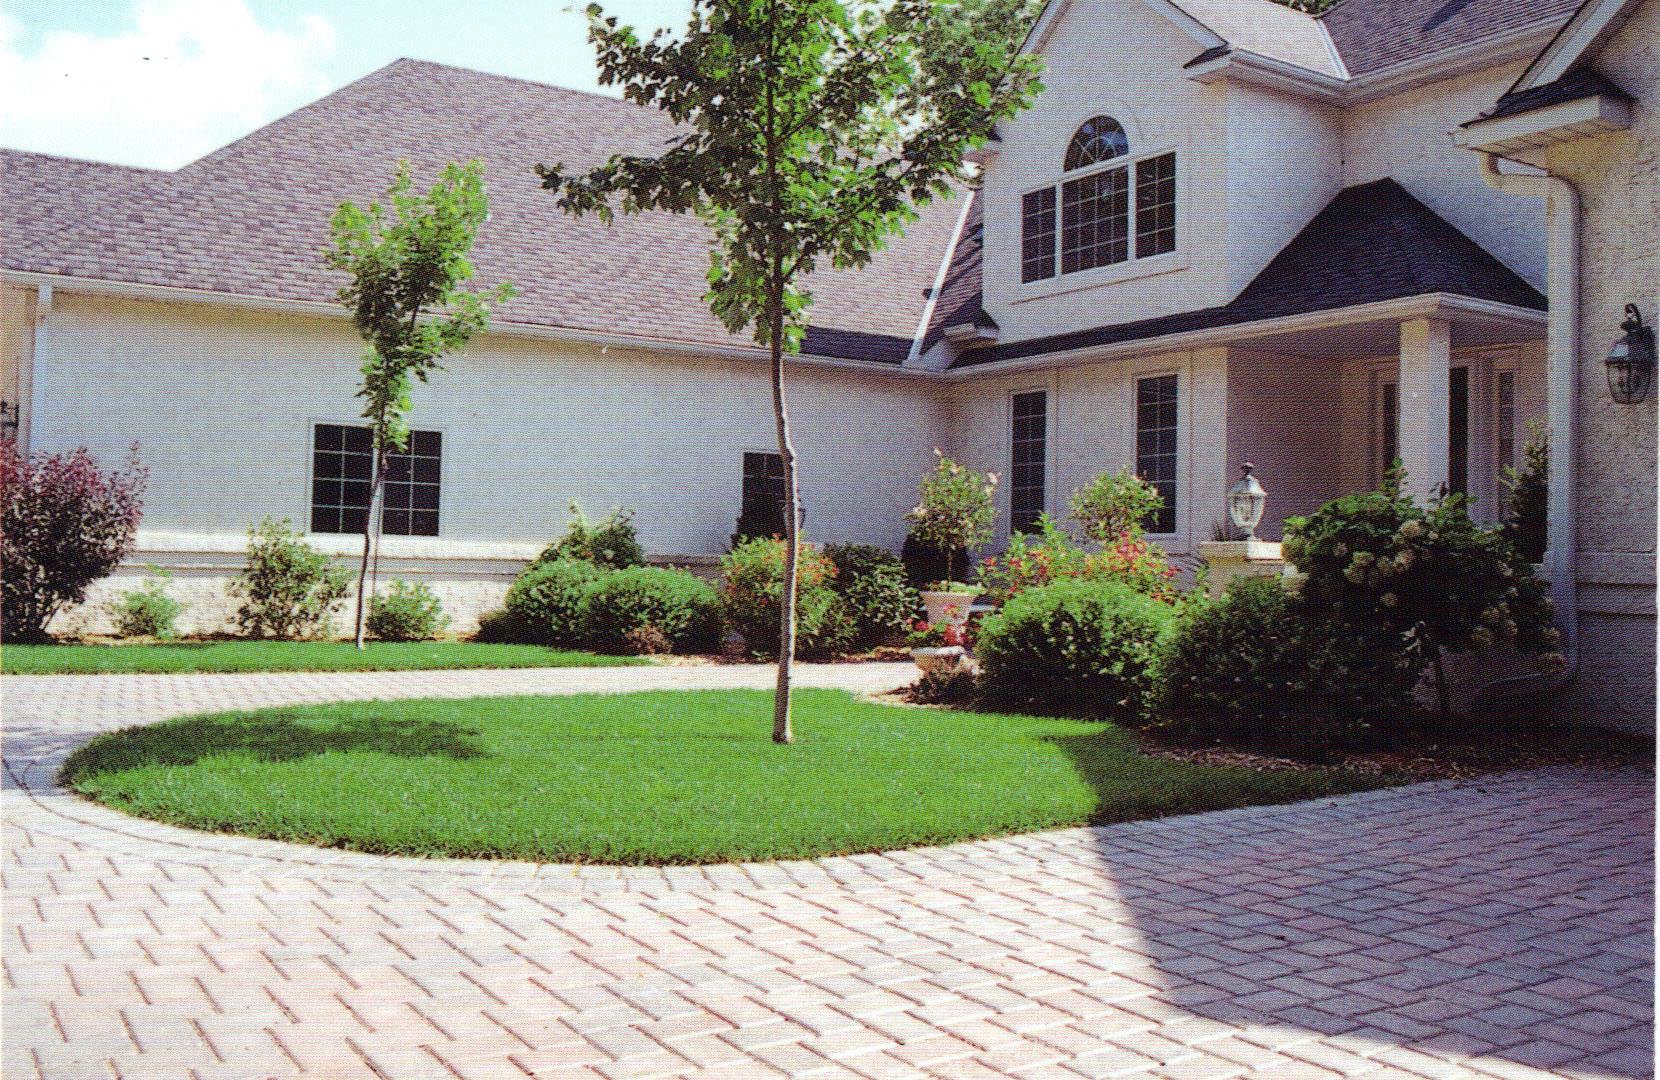 Paver Driveway and Complete Landscape